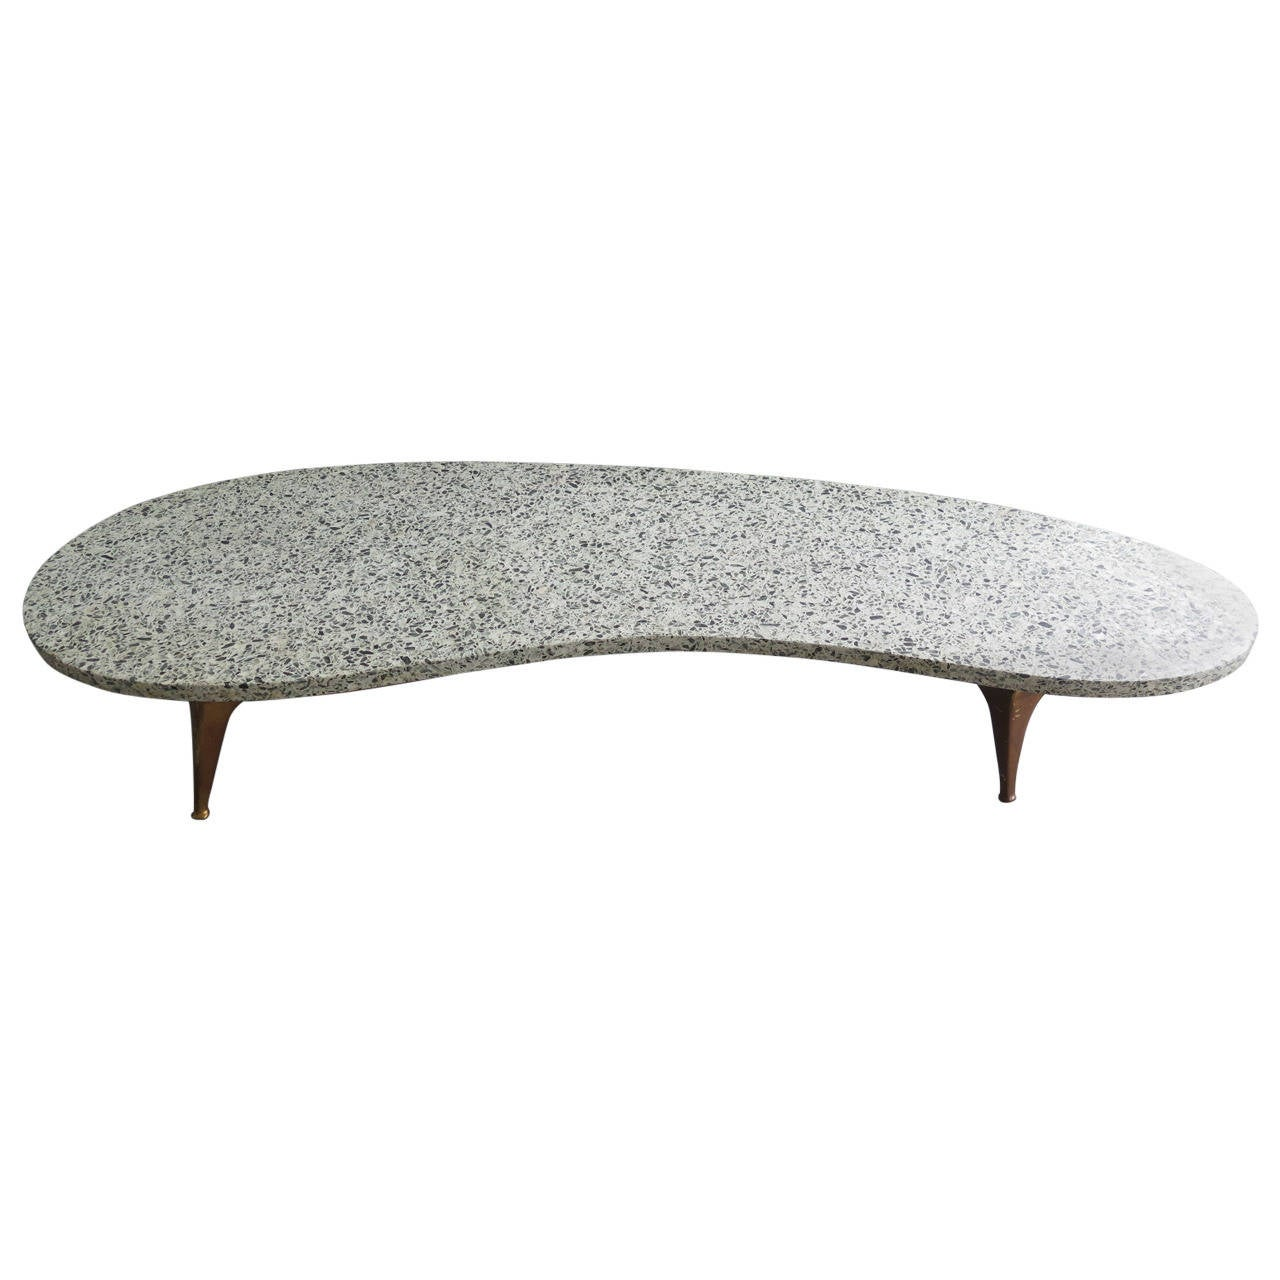 Unusual Terrazzo Biomorphic Coffee Table at 1stdibs